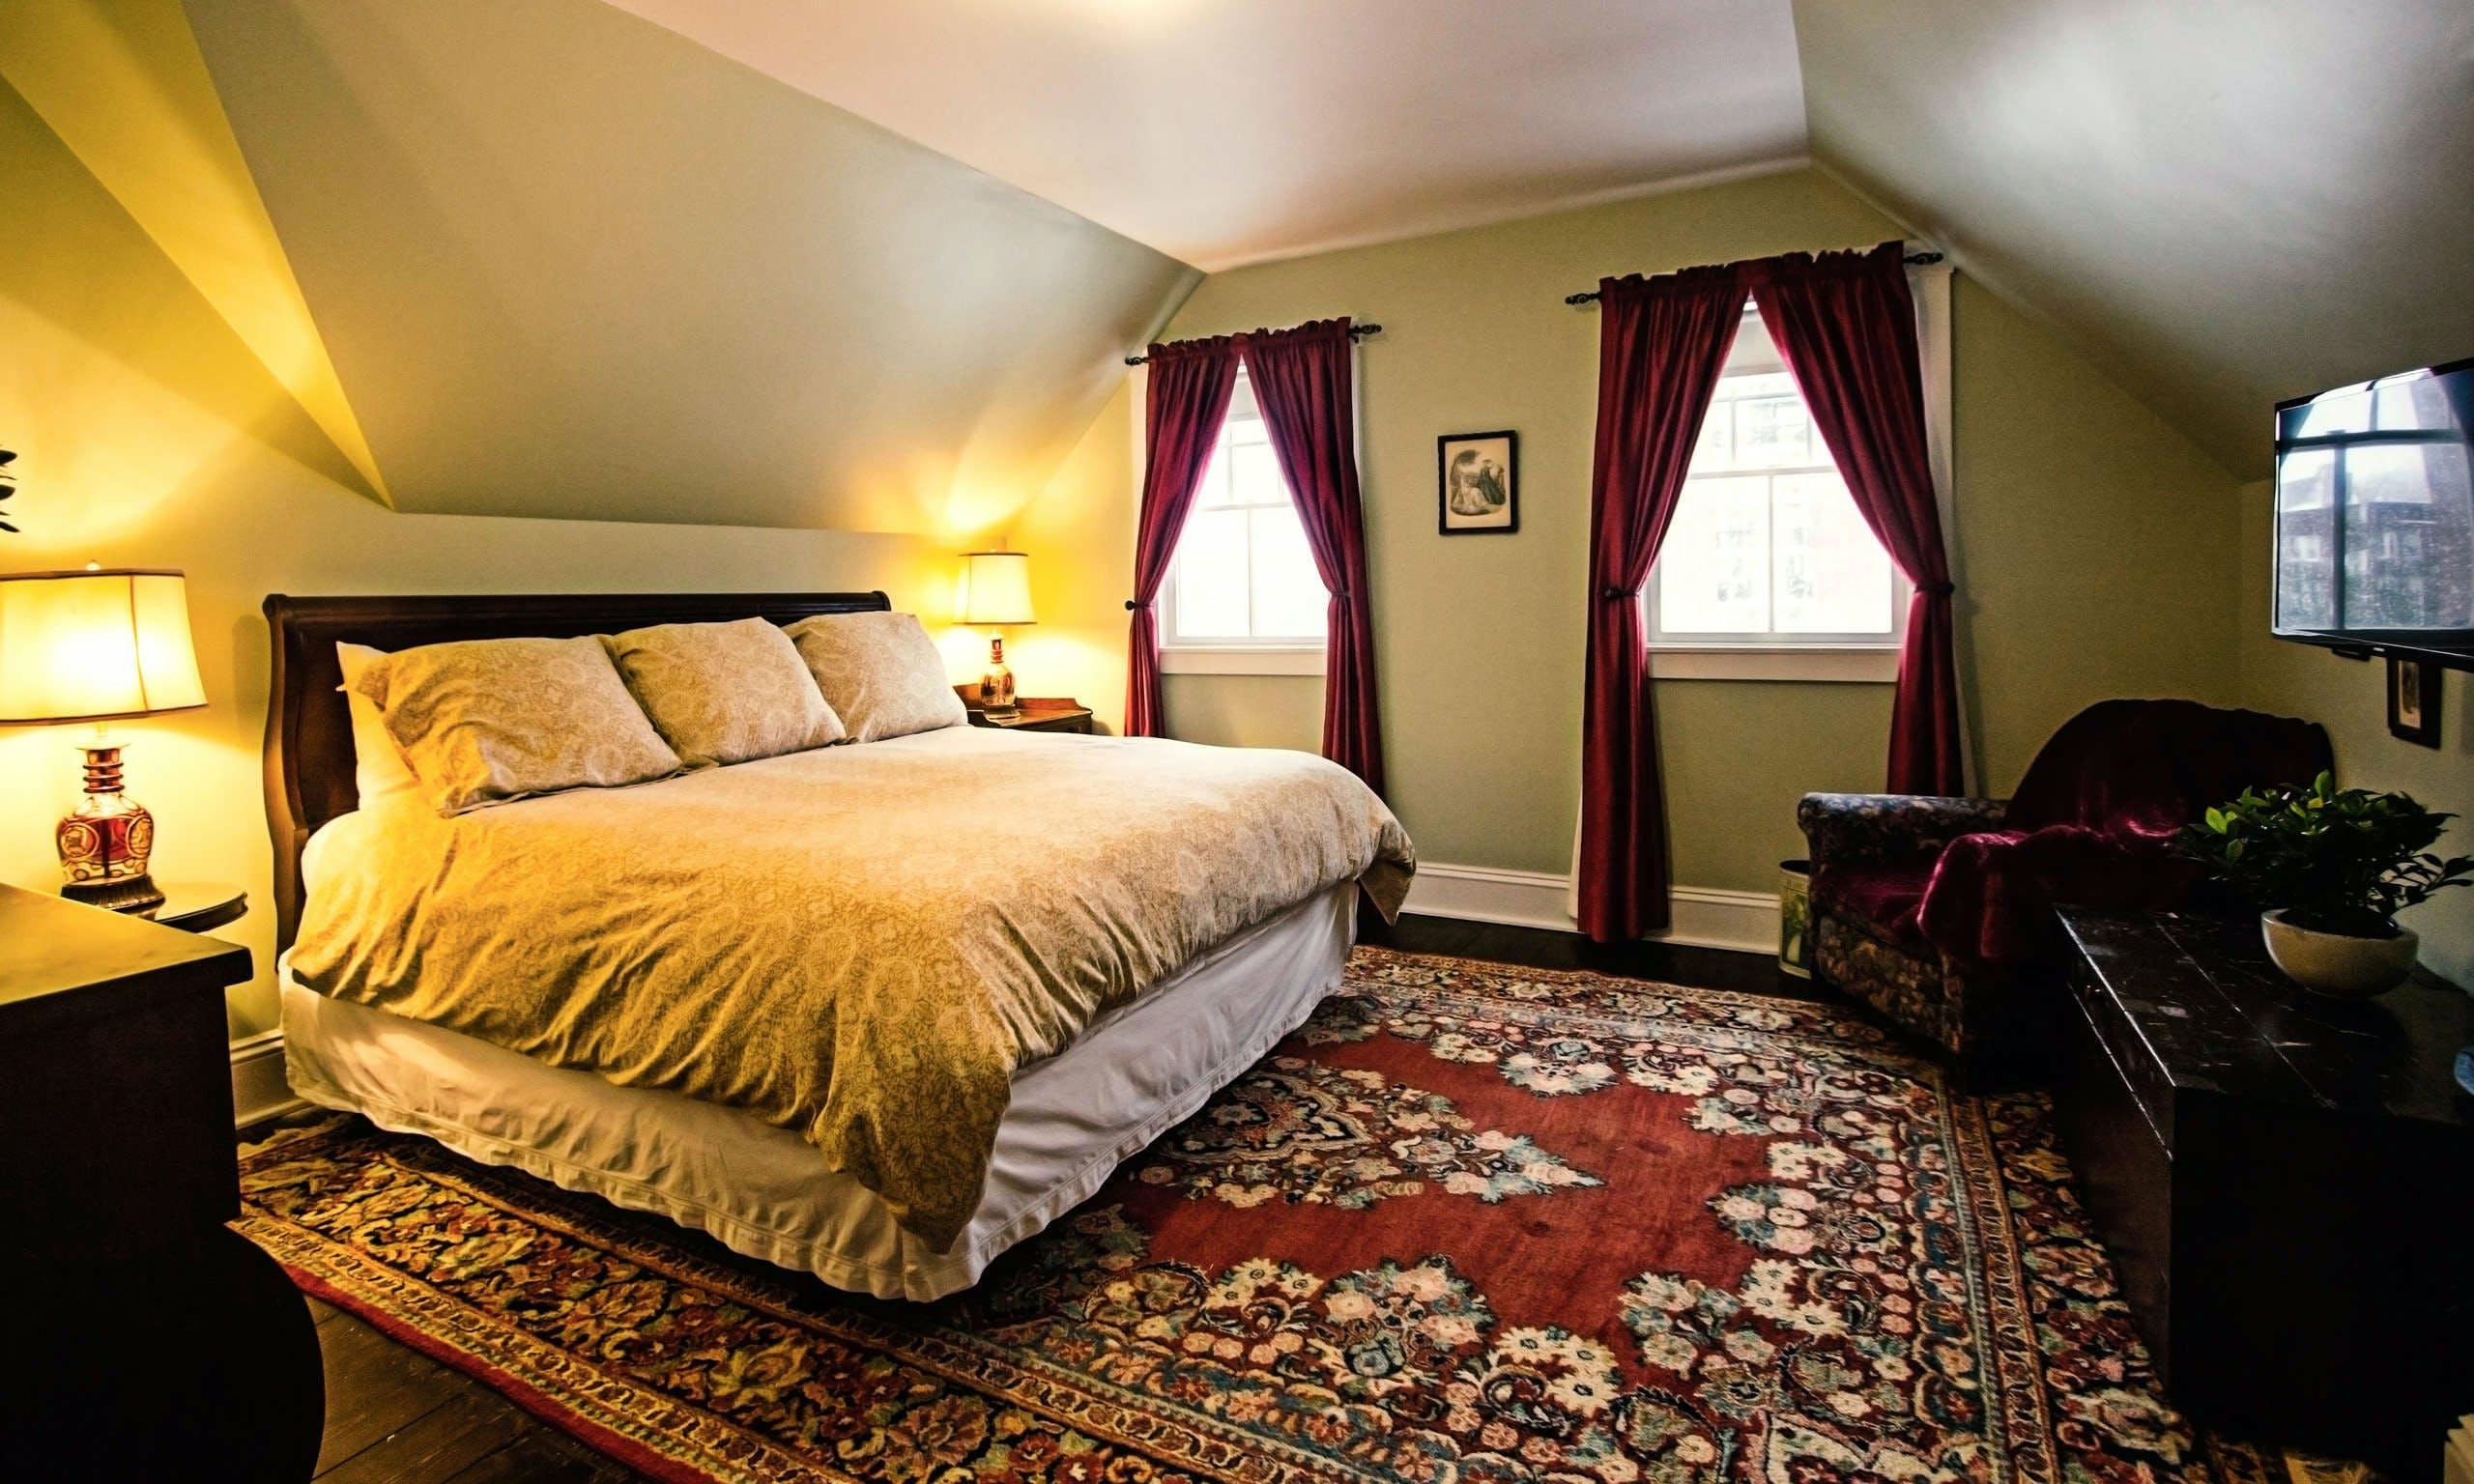 Last Minute Hotel Deals in Cambridge - HotelTonight